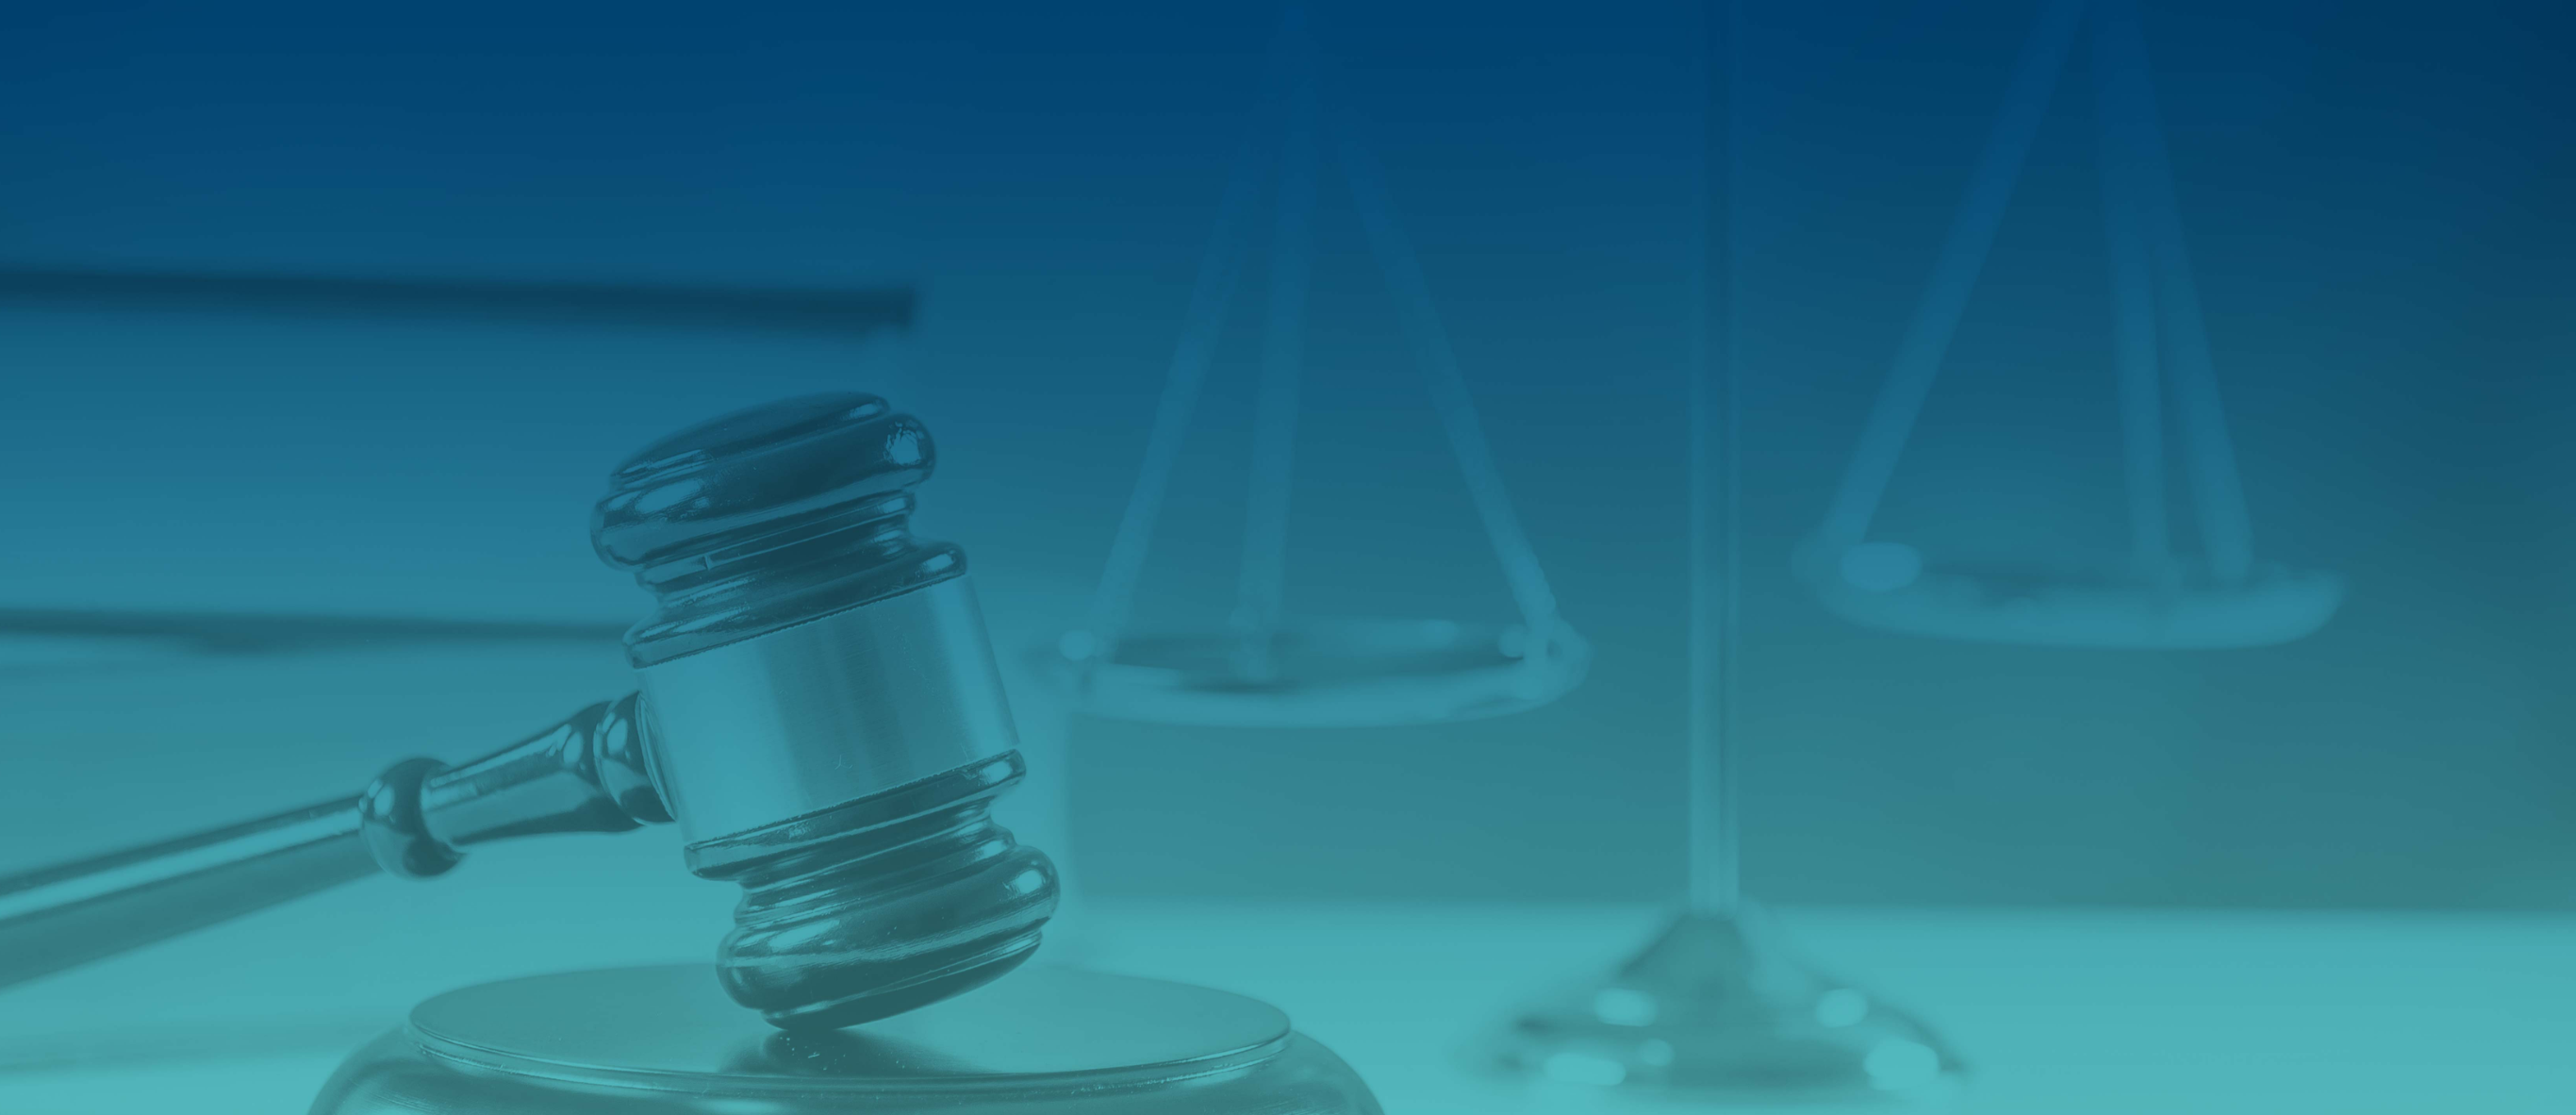 Courtroom gavel. Image has aqua tint overlaid.